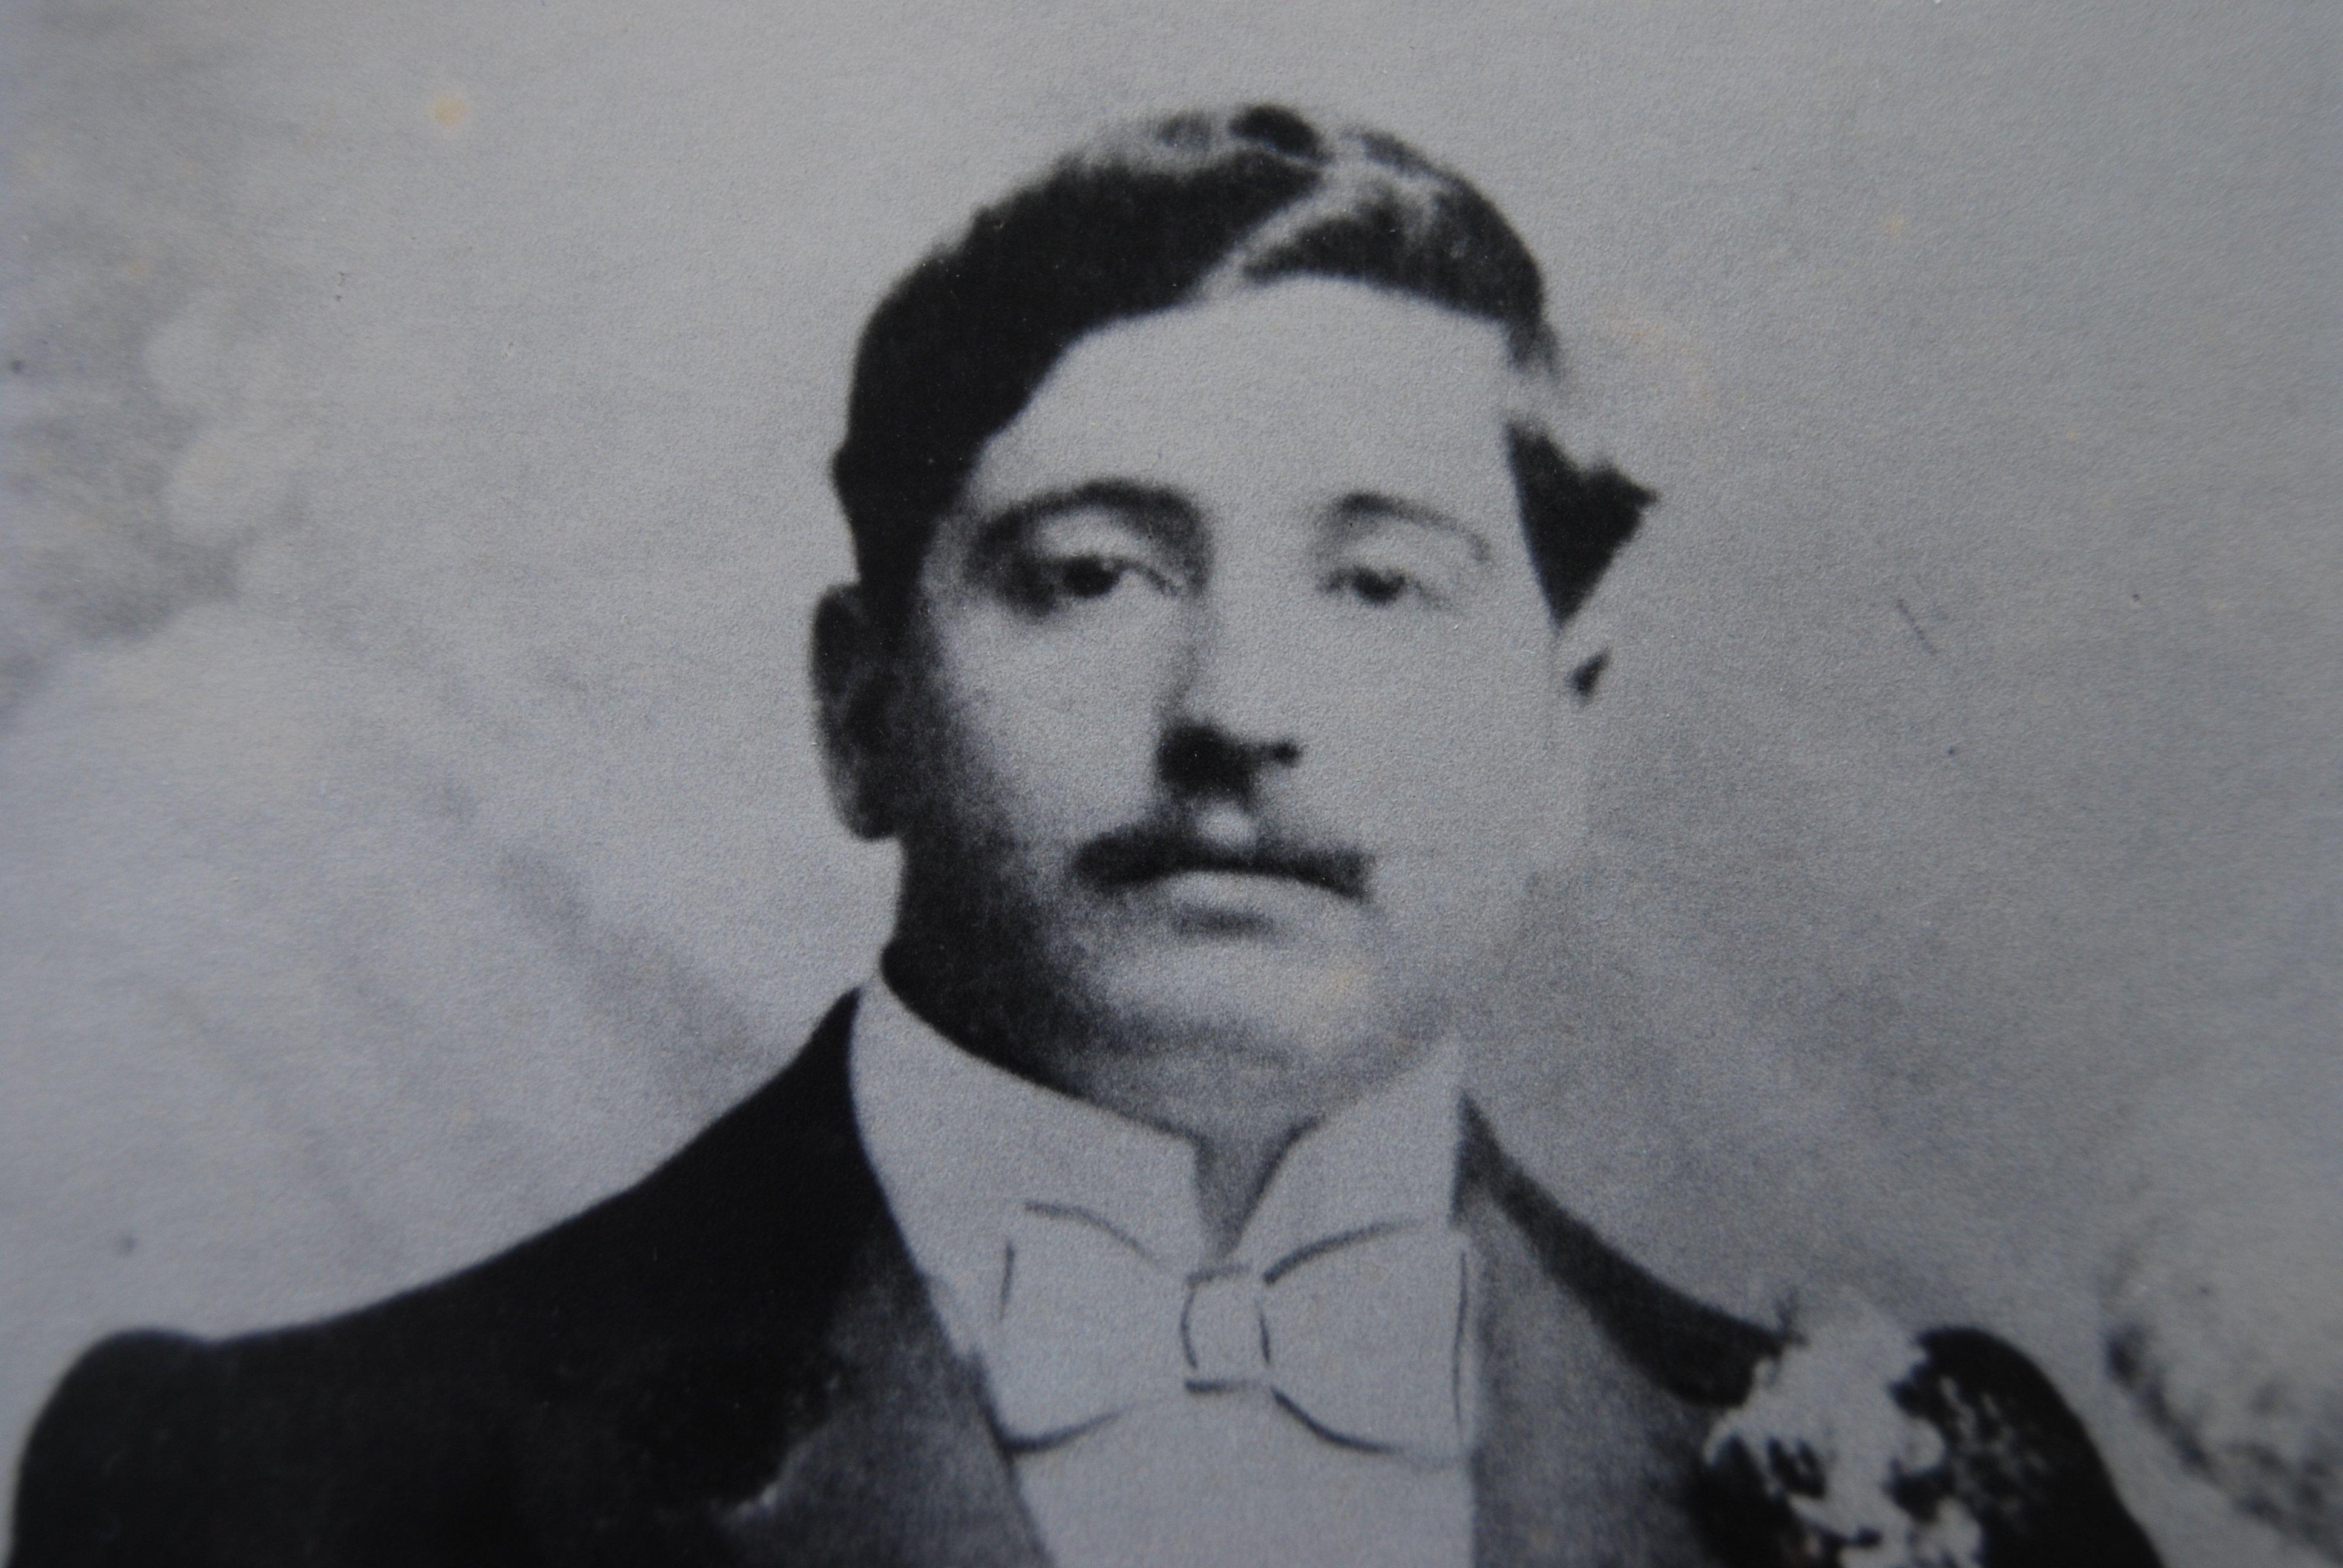 George William Wood